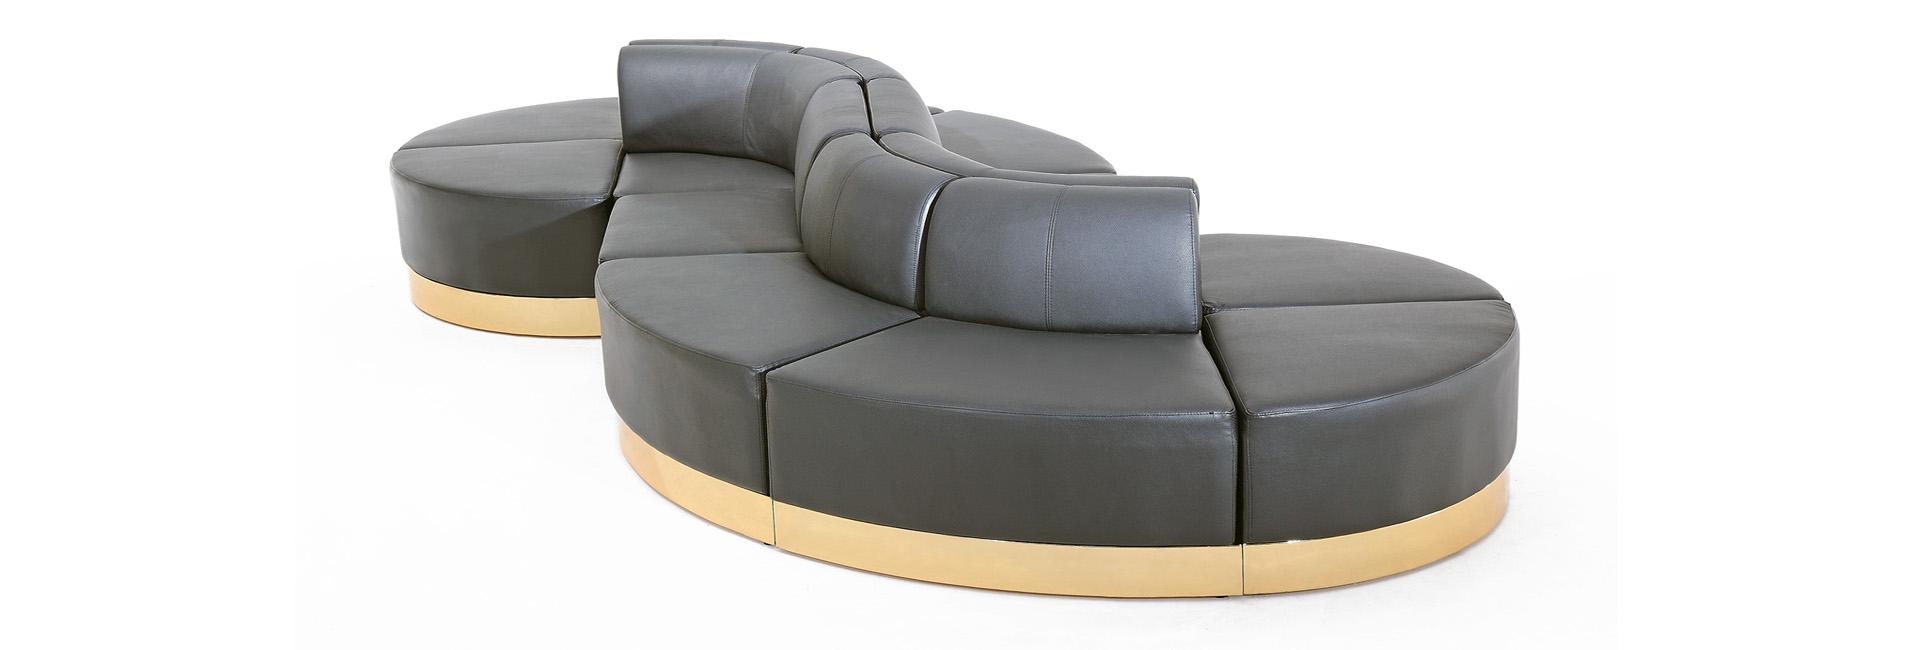 Collection of modular lounge furniture